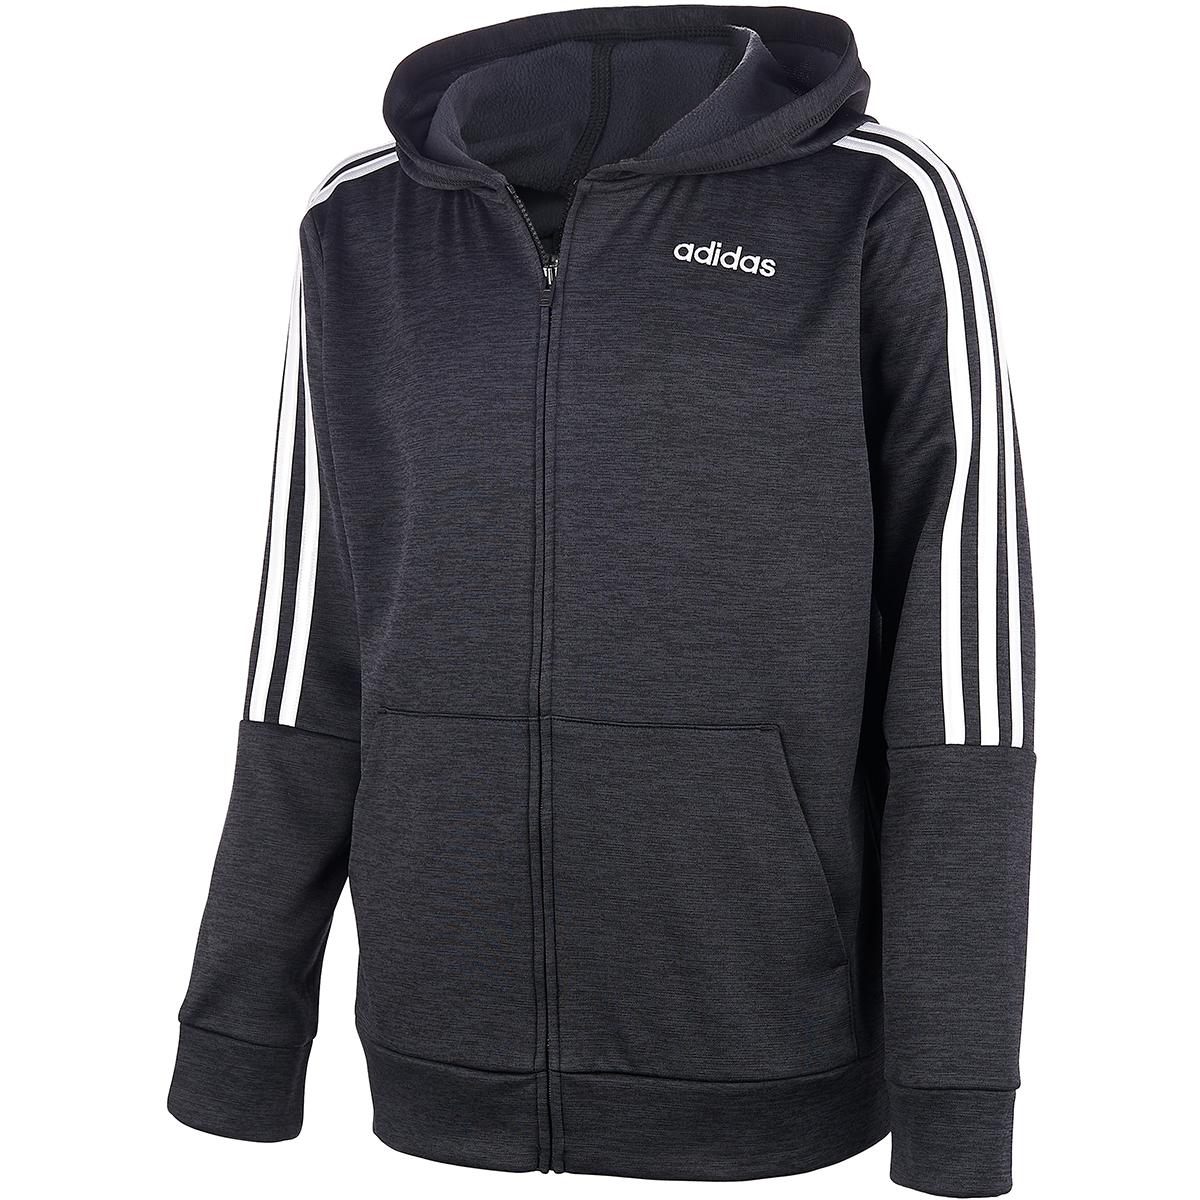 Adidas Boys' 8-20 Core Hooded Jacket - Black, M